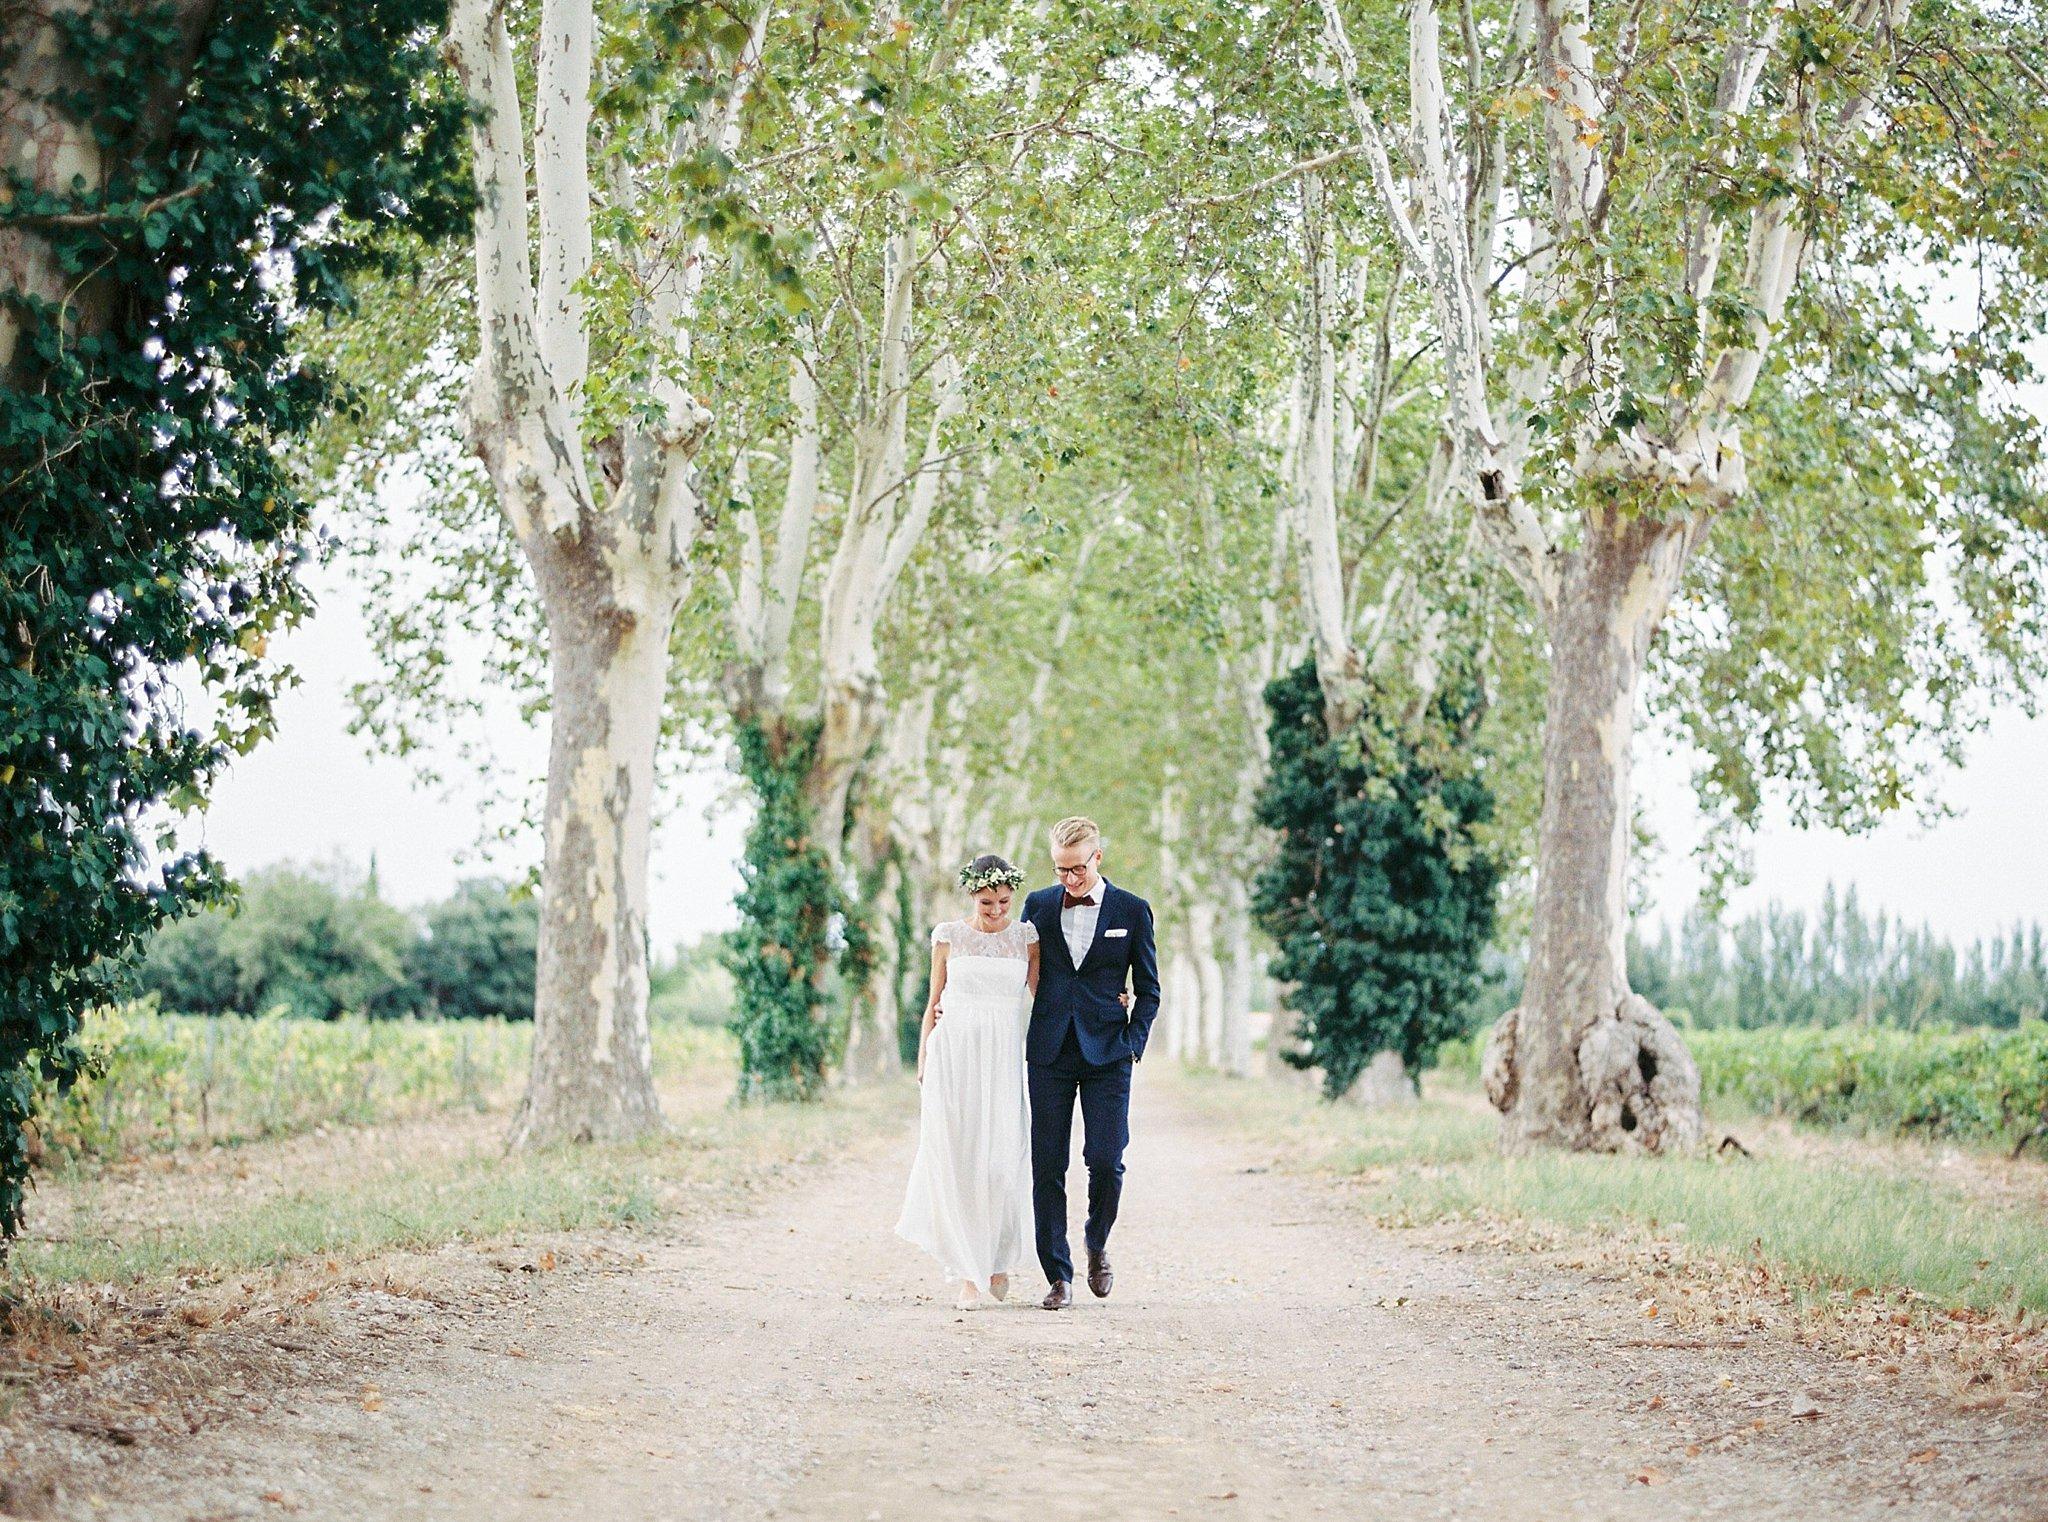 Wedding Photographer Perpignan - Château Las Collas Wedding - Hugo Hennequin020.jpg